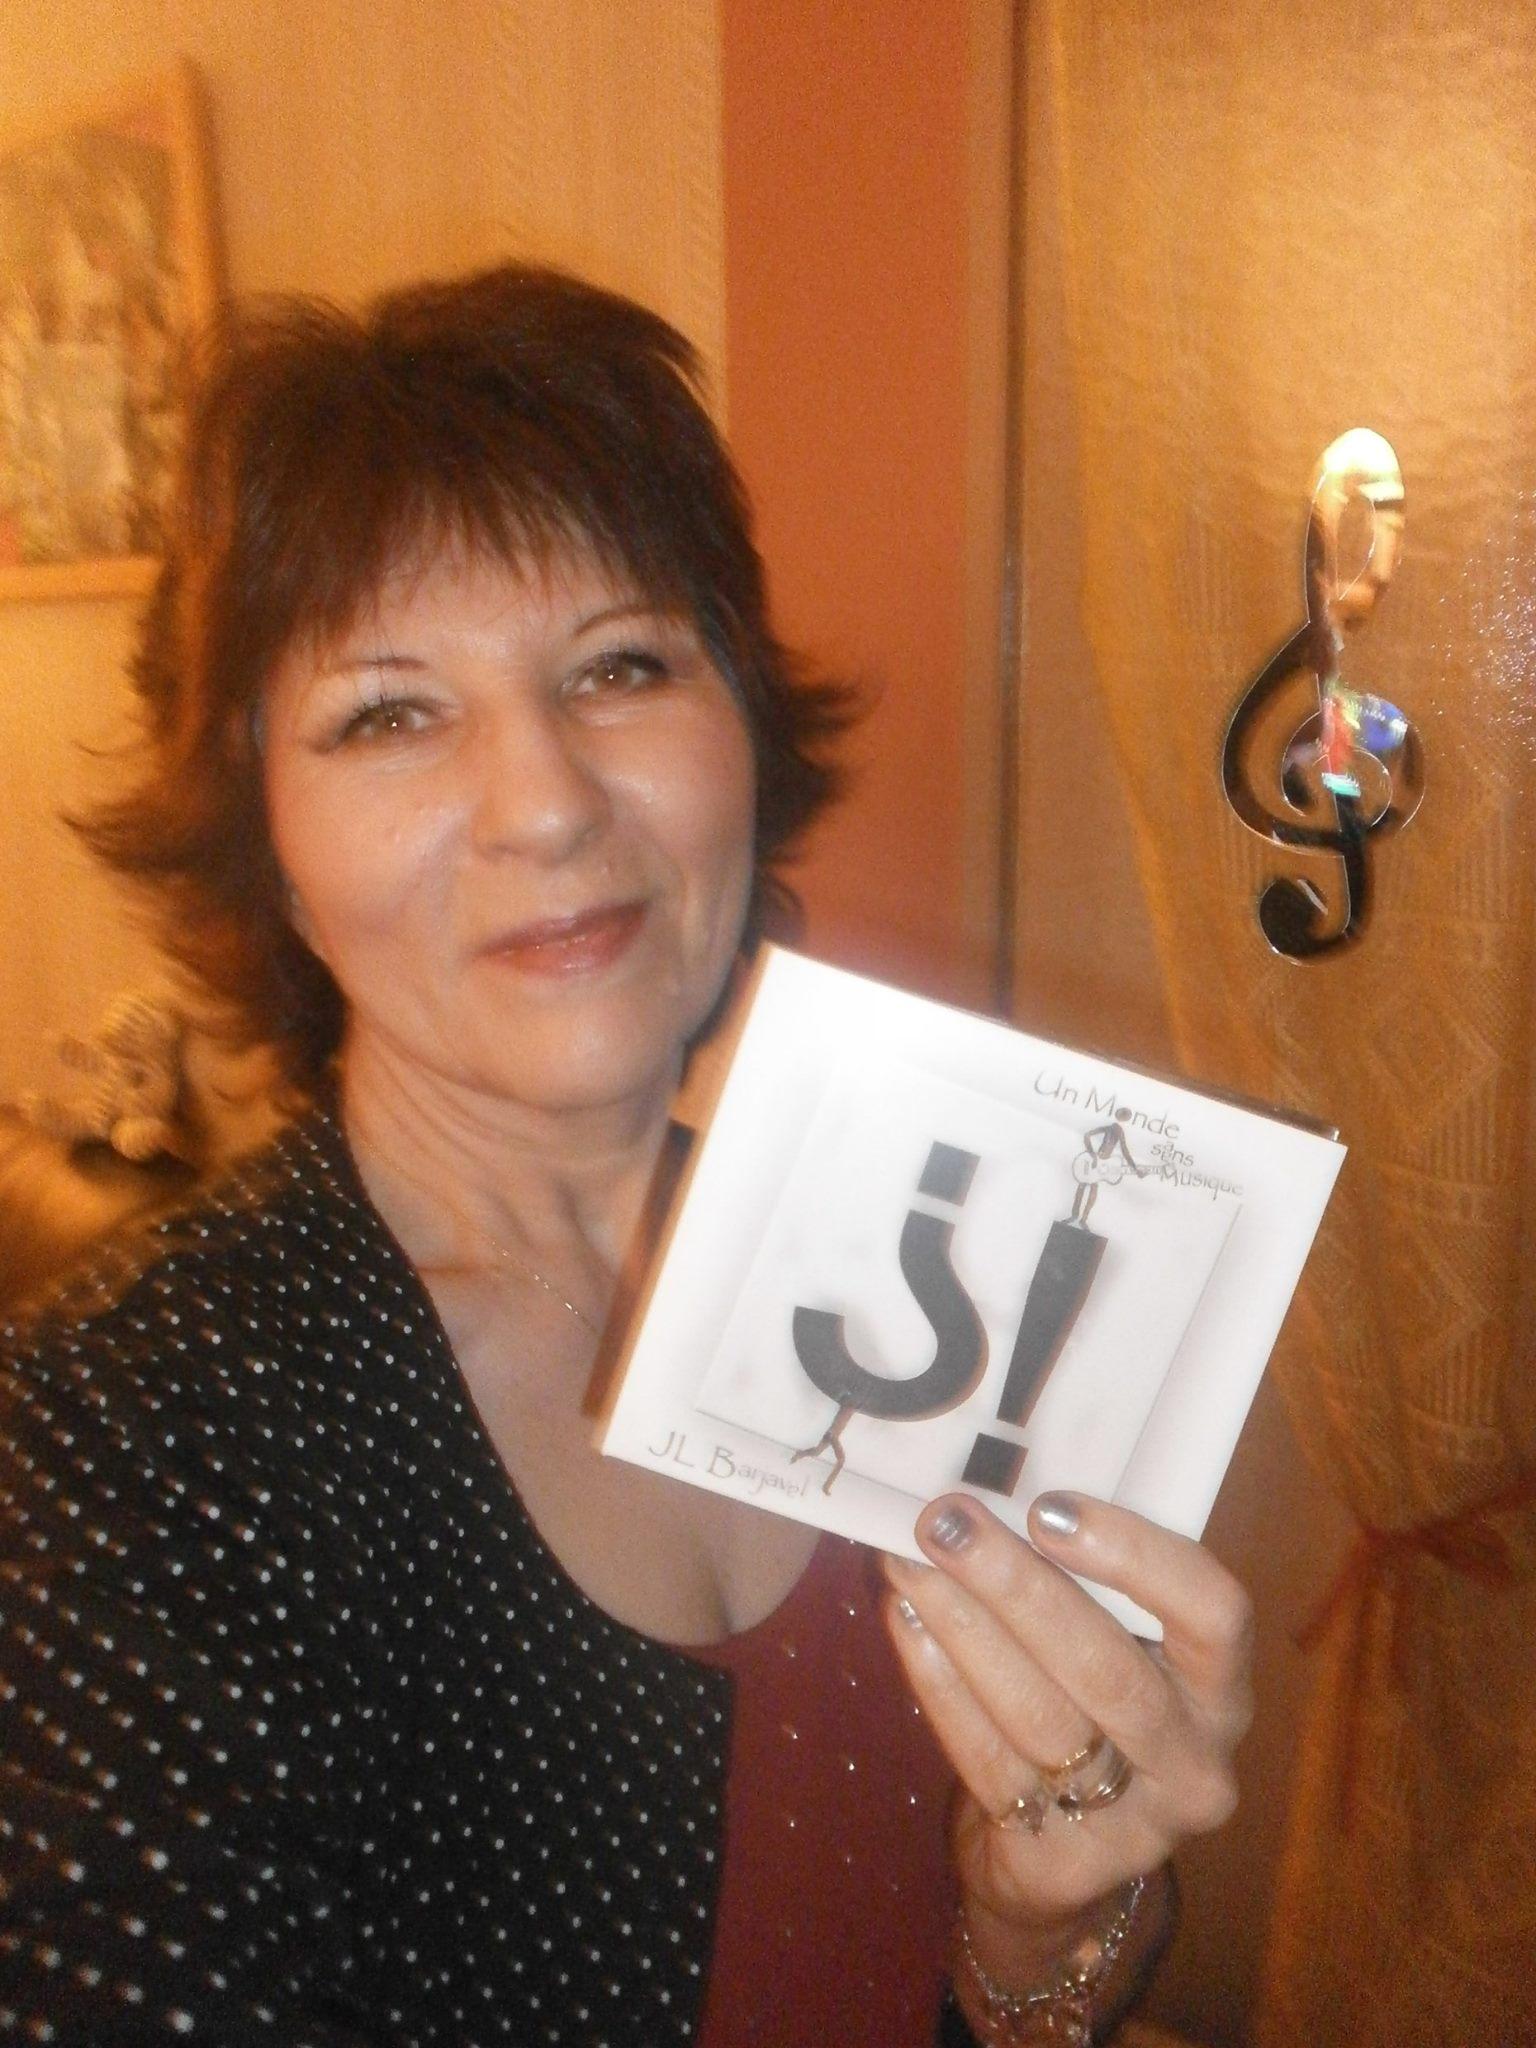 JL Album by Sylvia 101.jpg